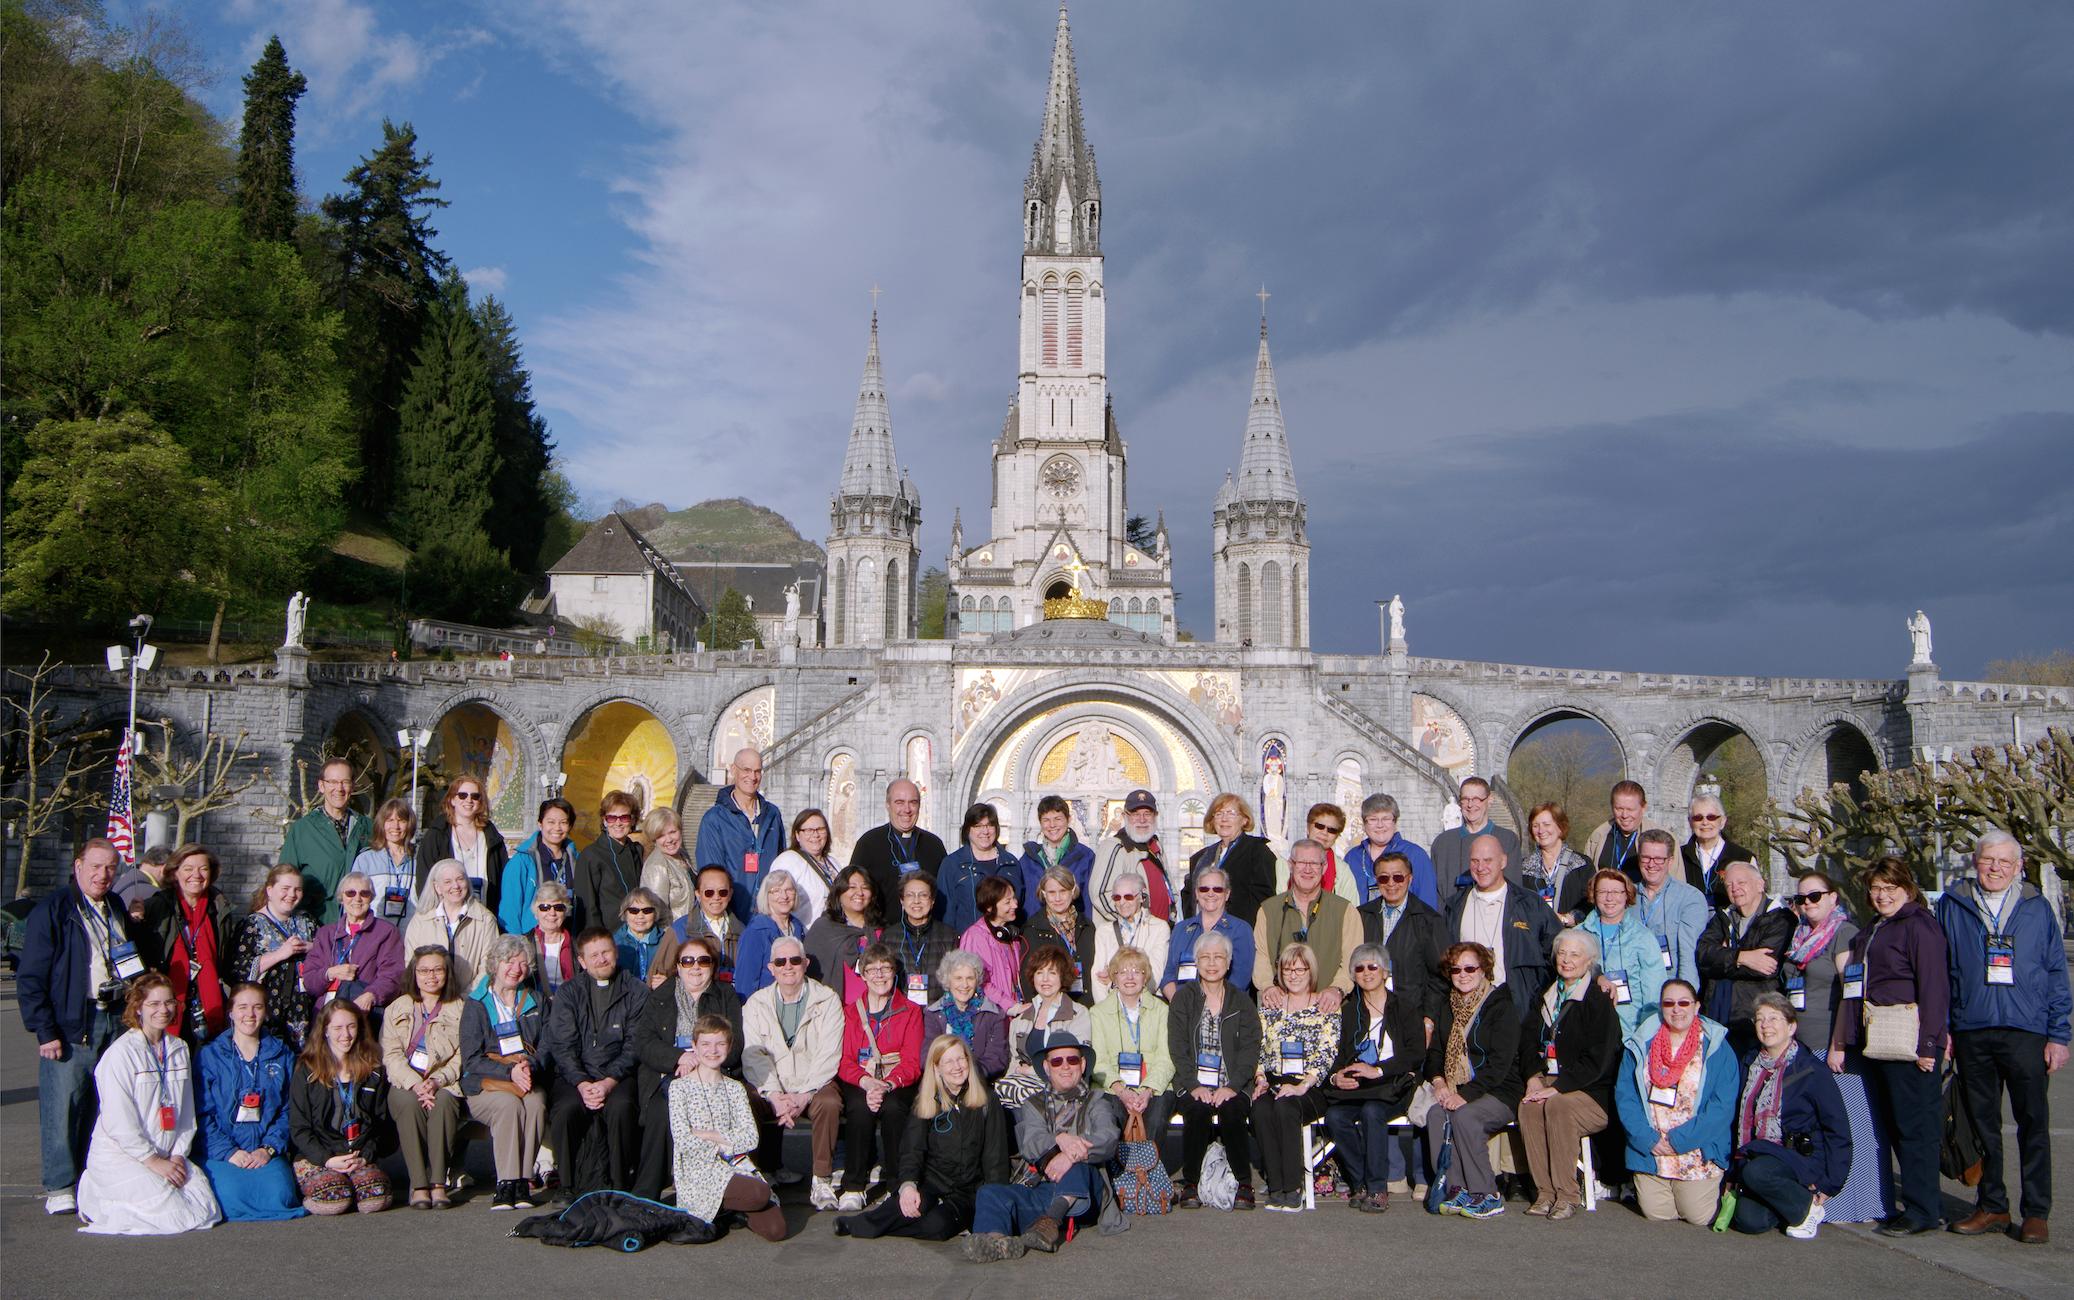 Full Day at Lourdes France including Tour of Shrine and Bernadette's ...